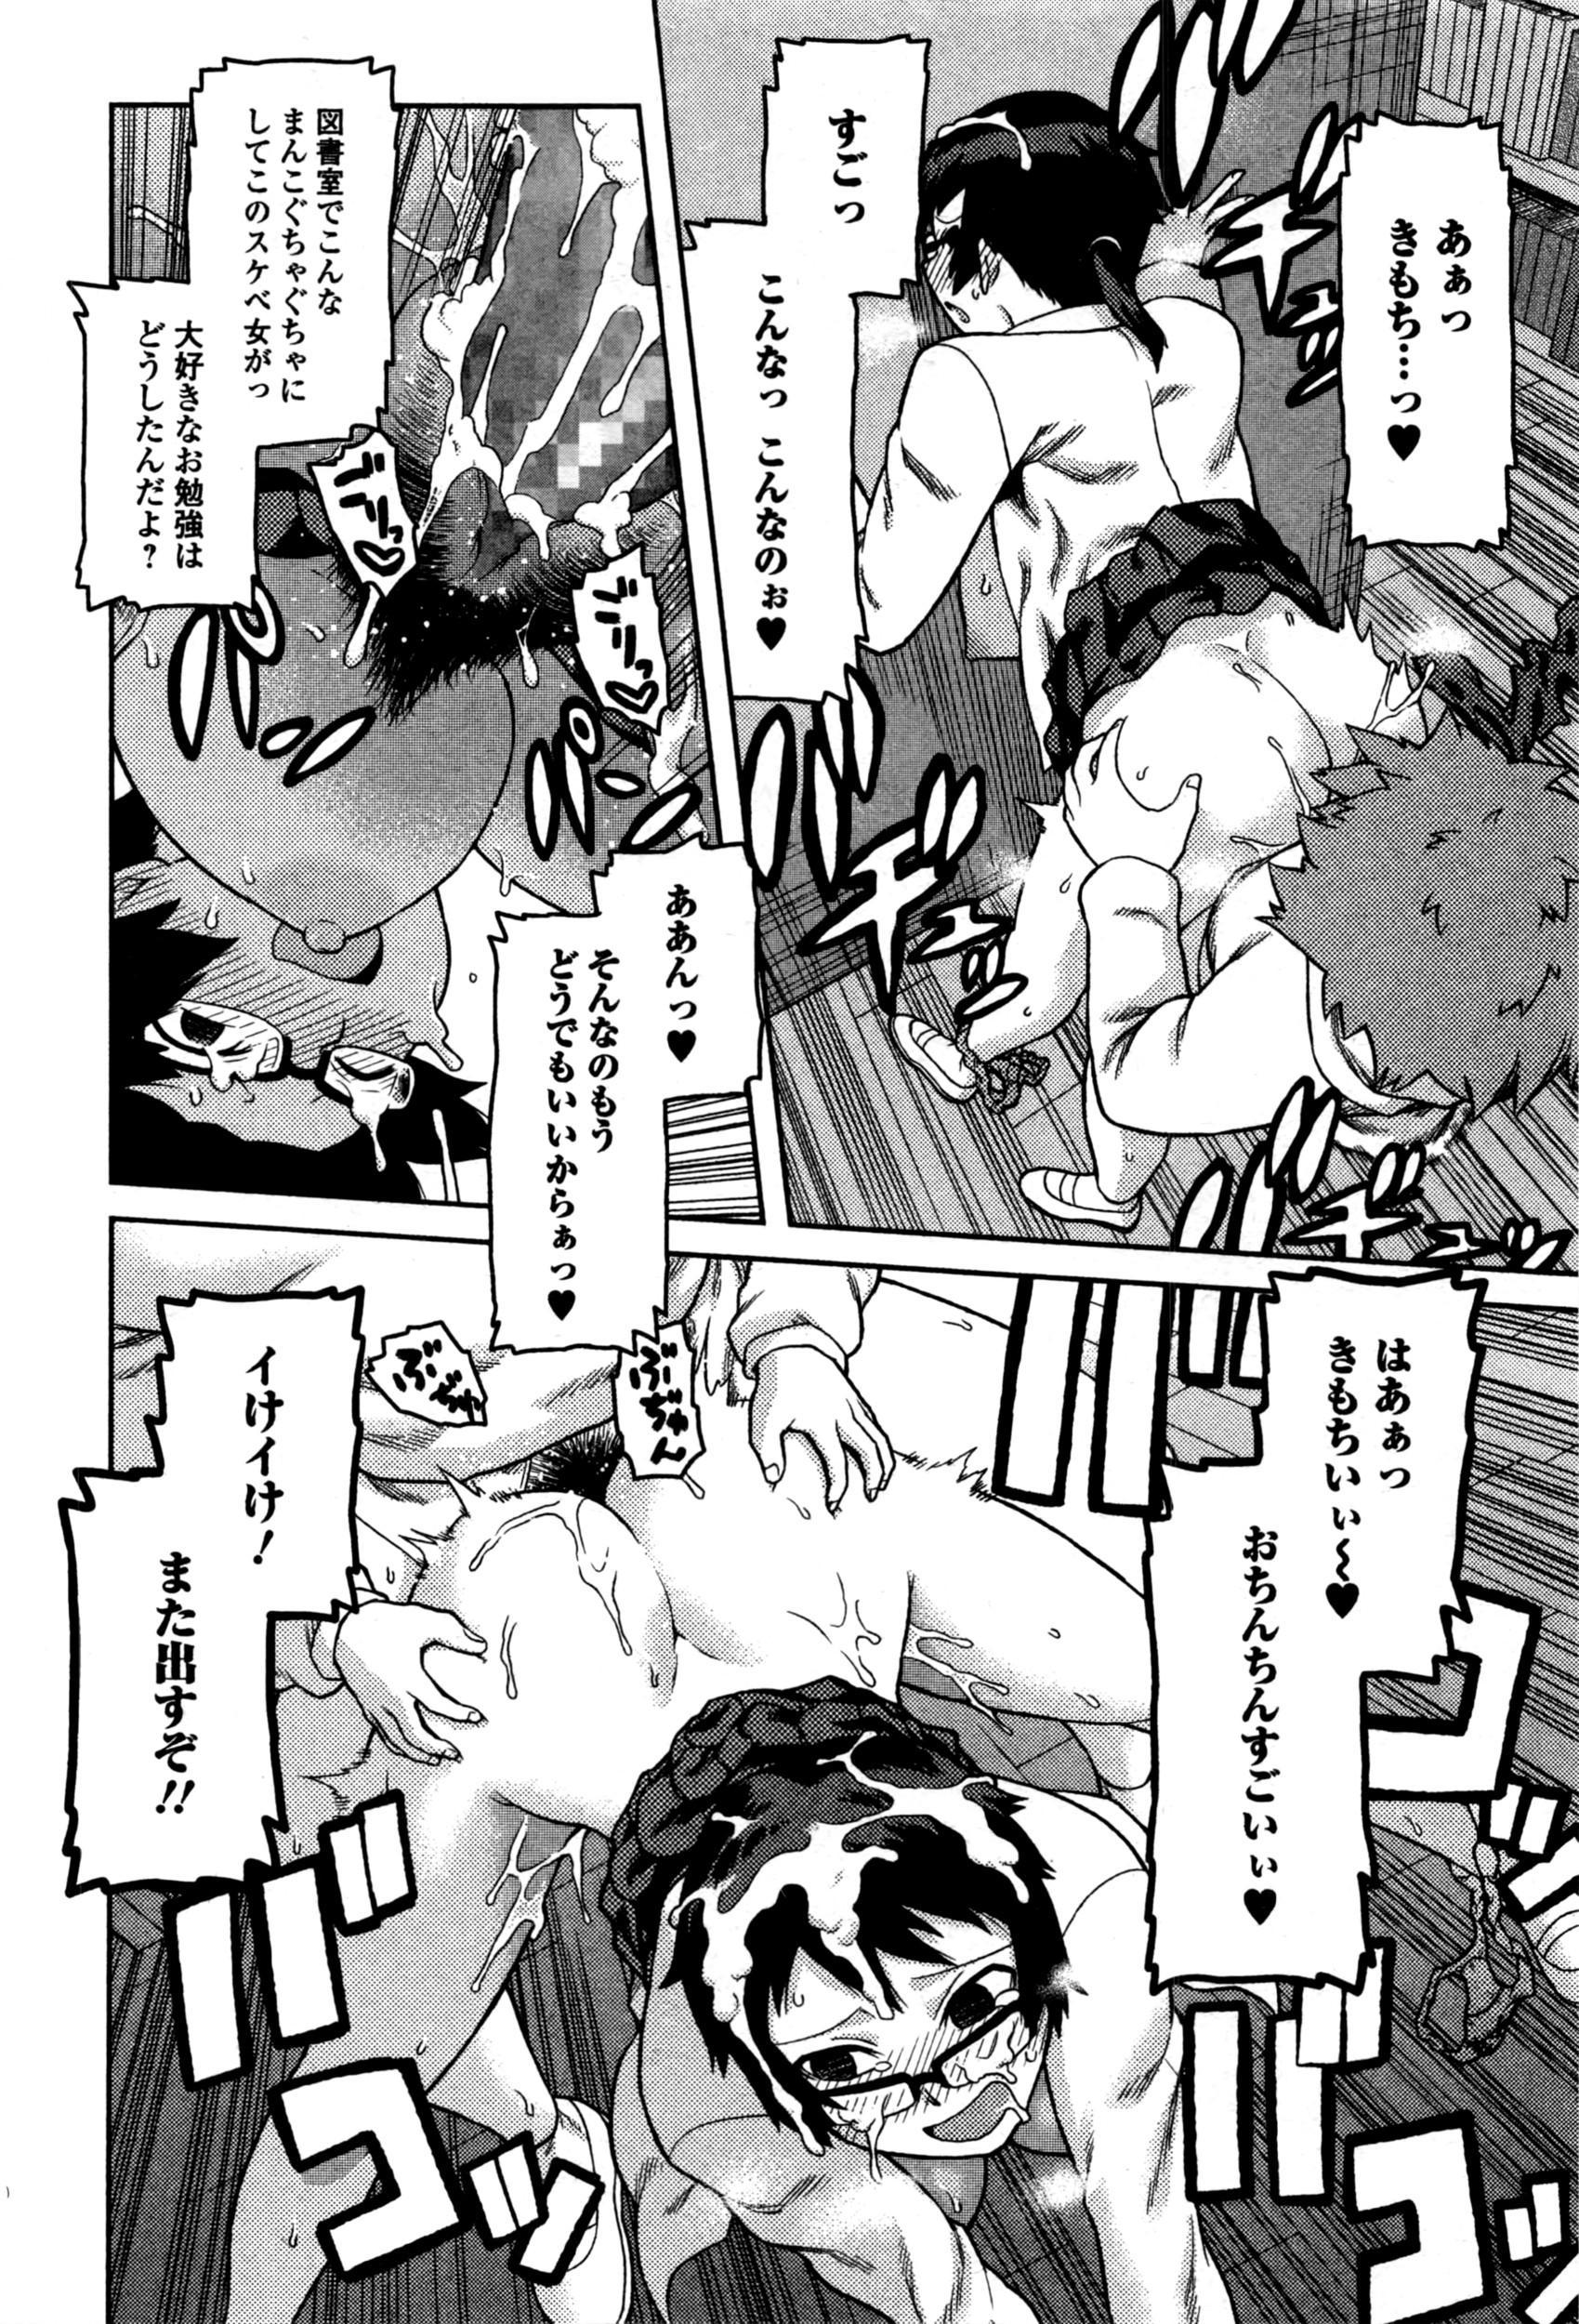 Comic JSCK Vol.3 2016-03 248